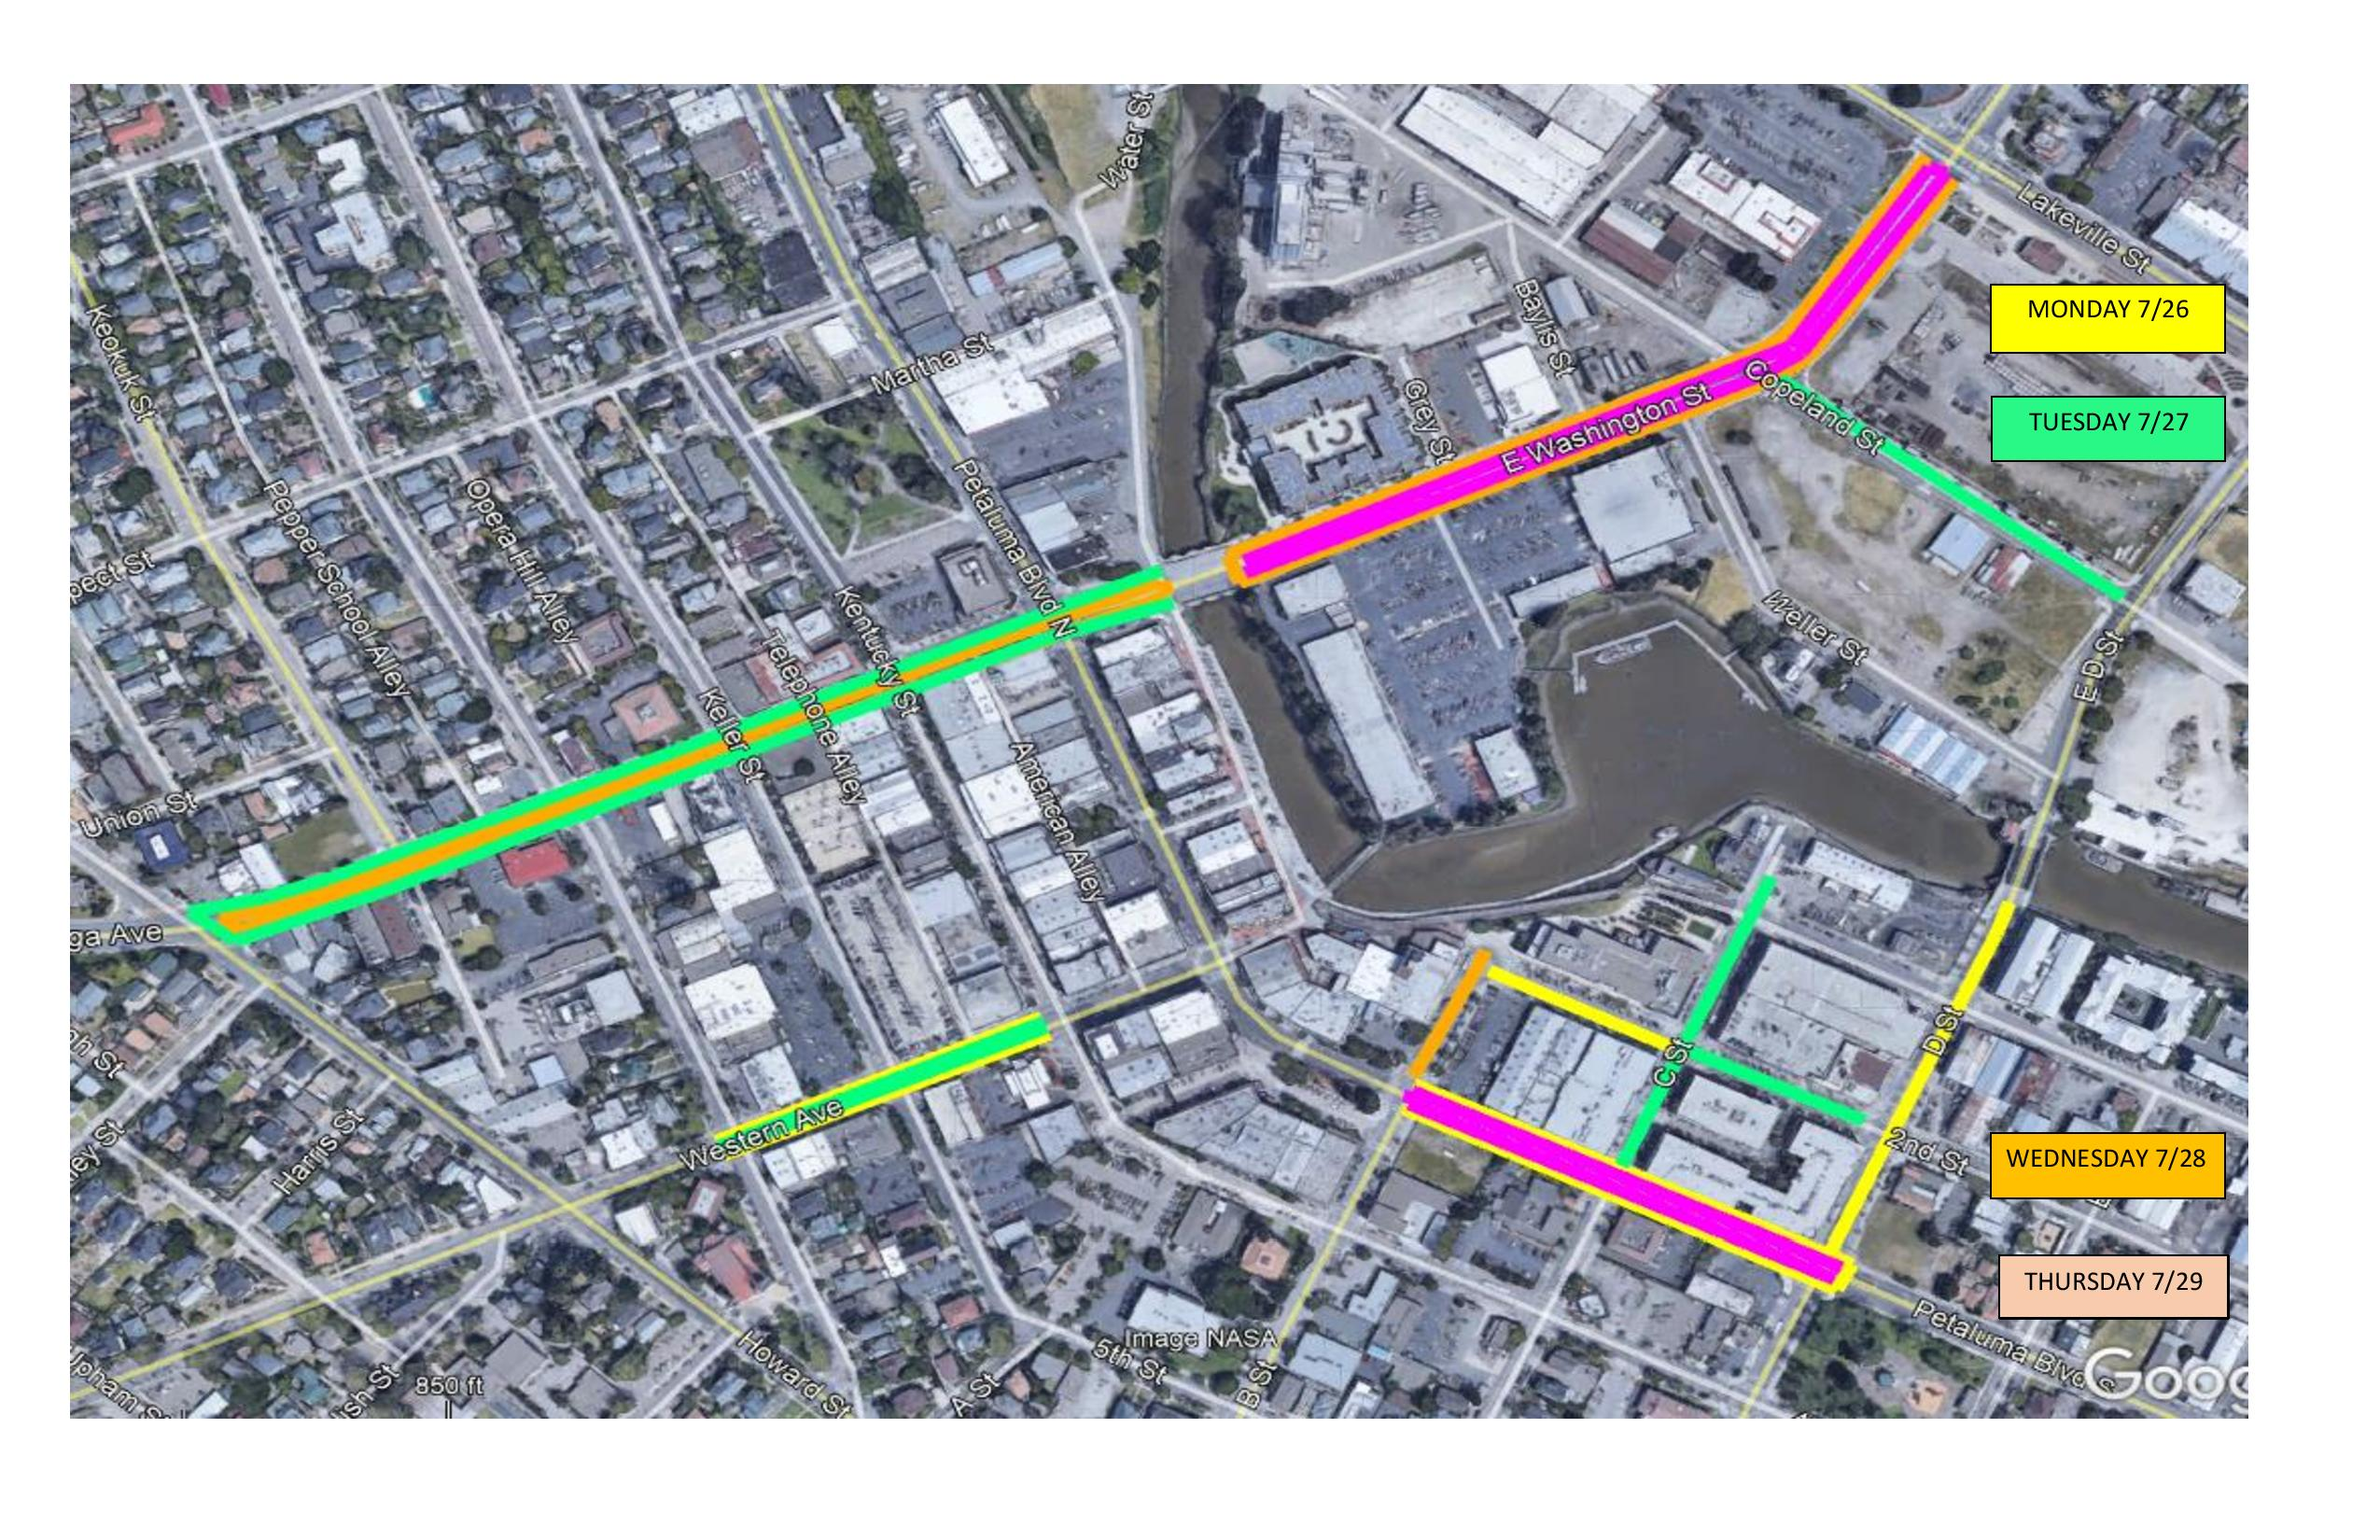 Pavement Map 3 7_26 thru 7_29